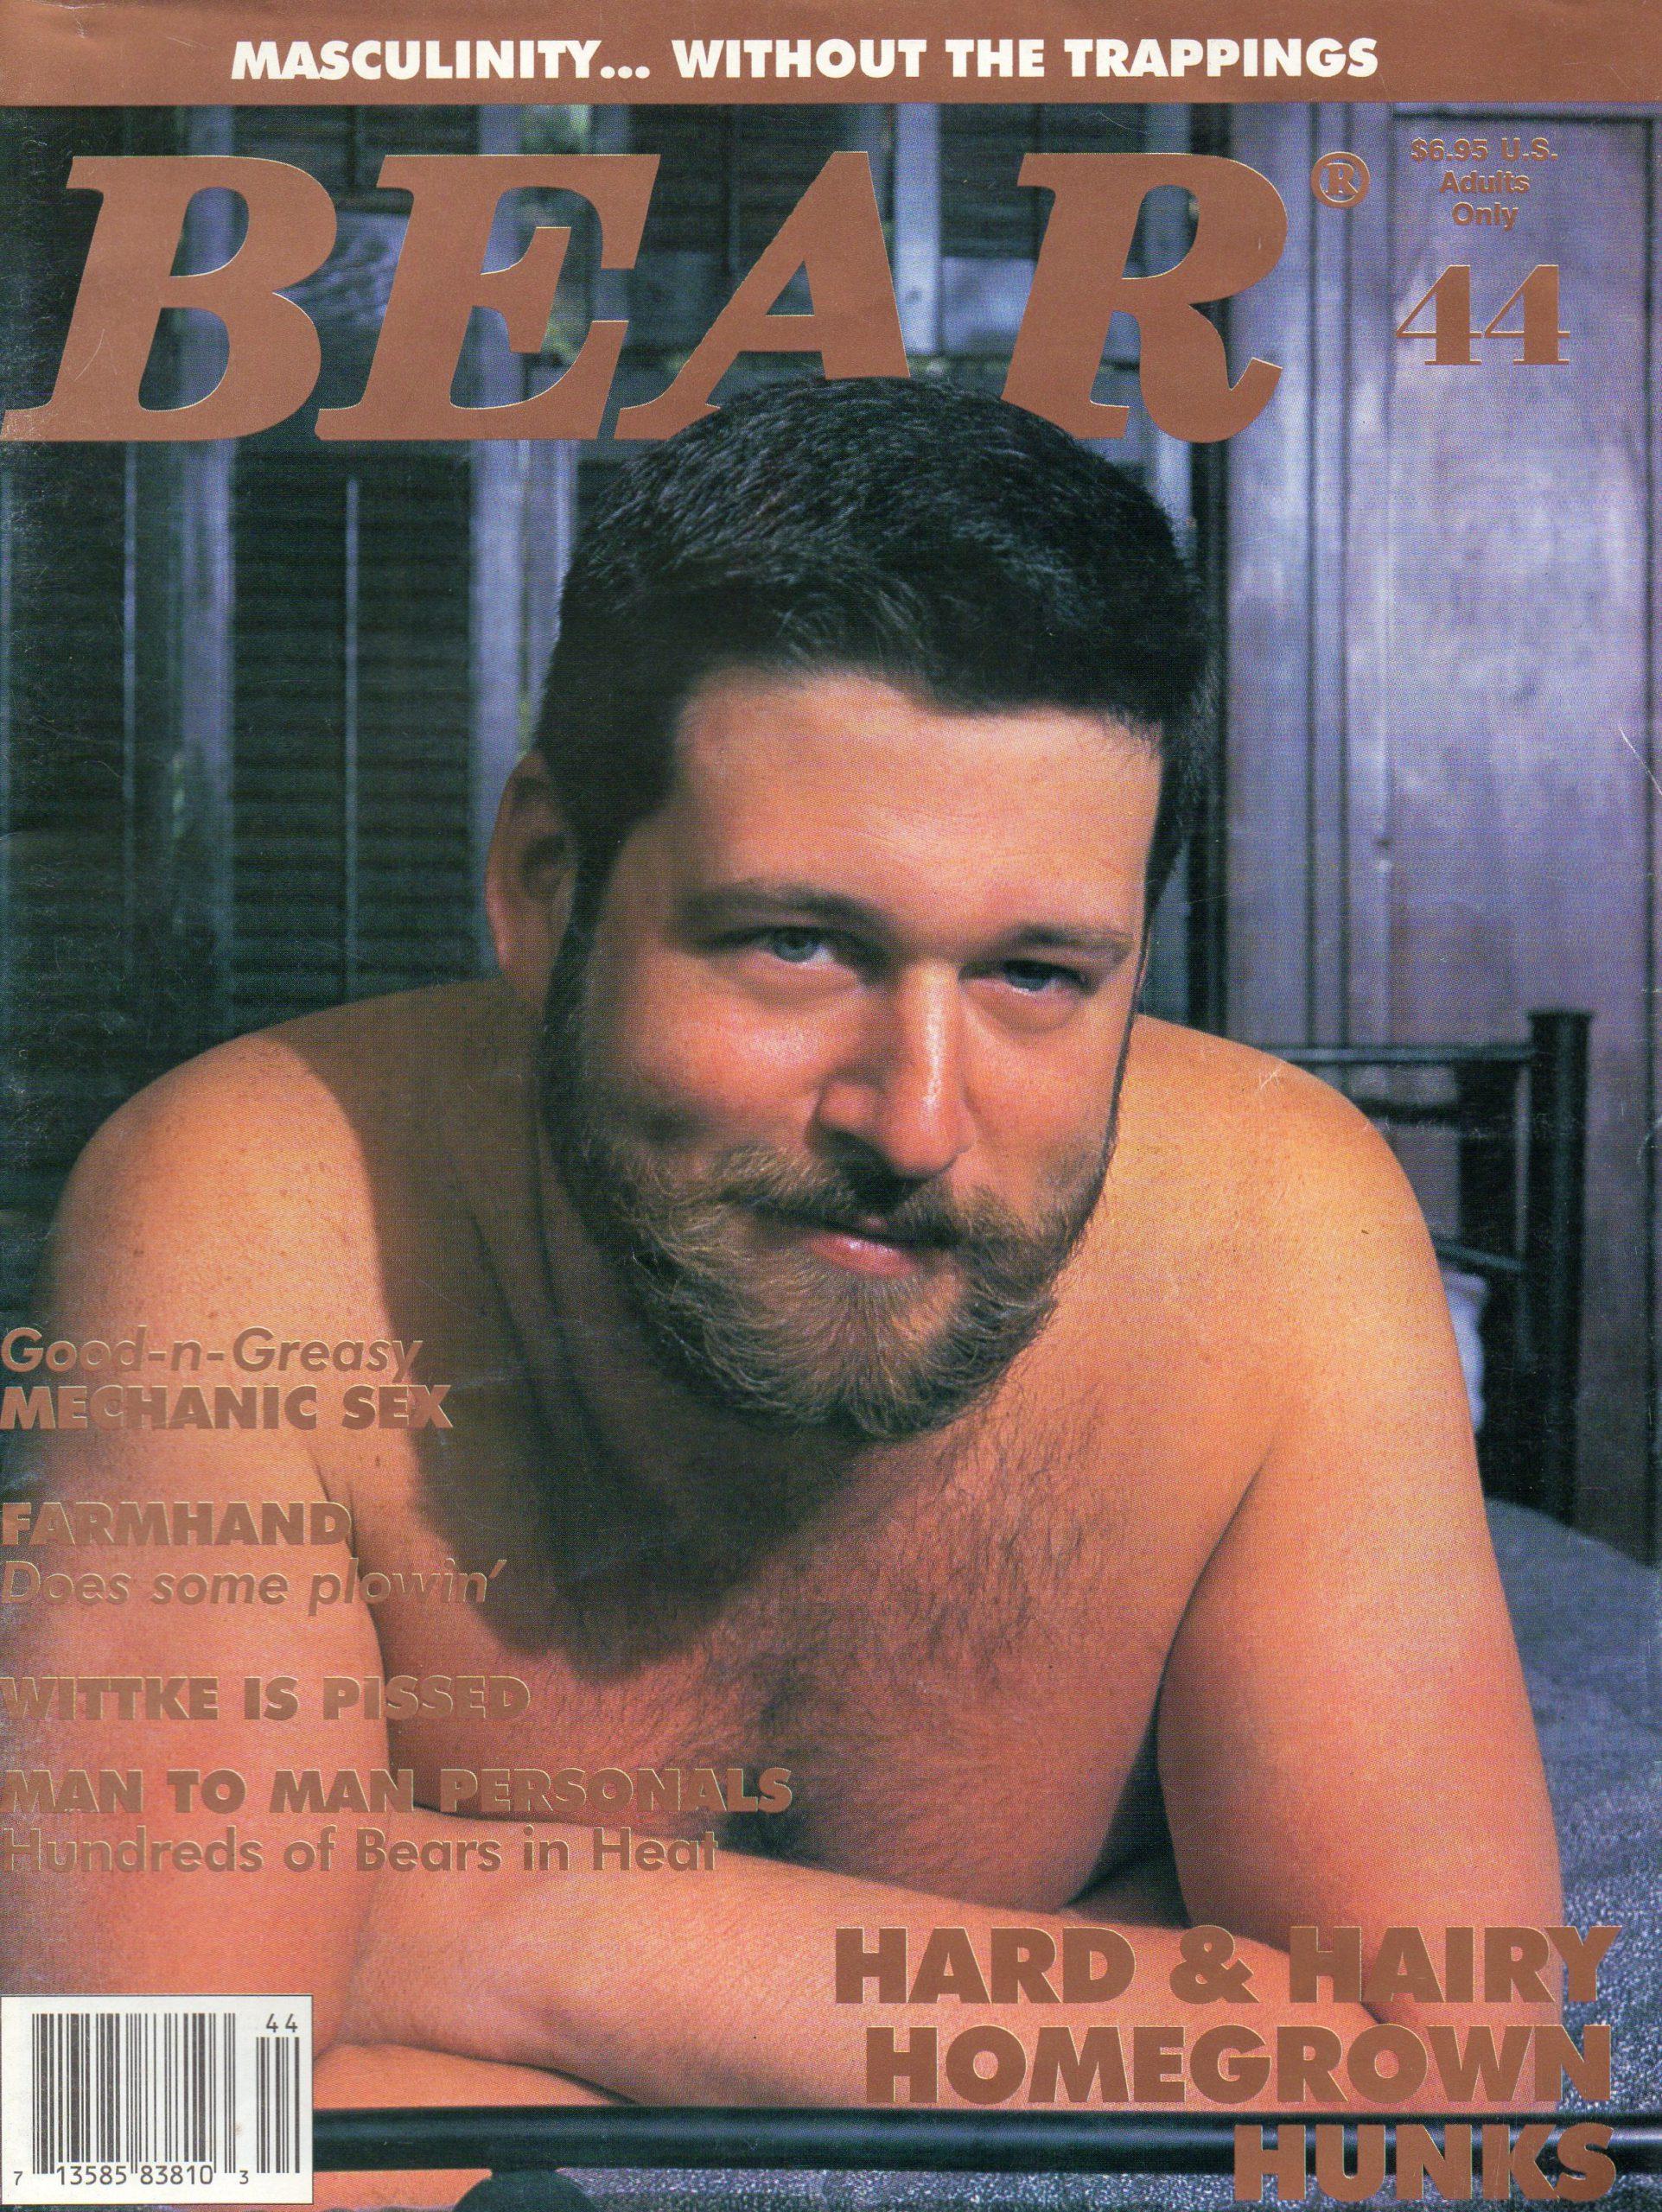 BEAR Magazine (Issue 44) Gay Male Digest Magazinev